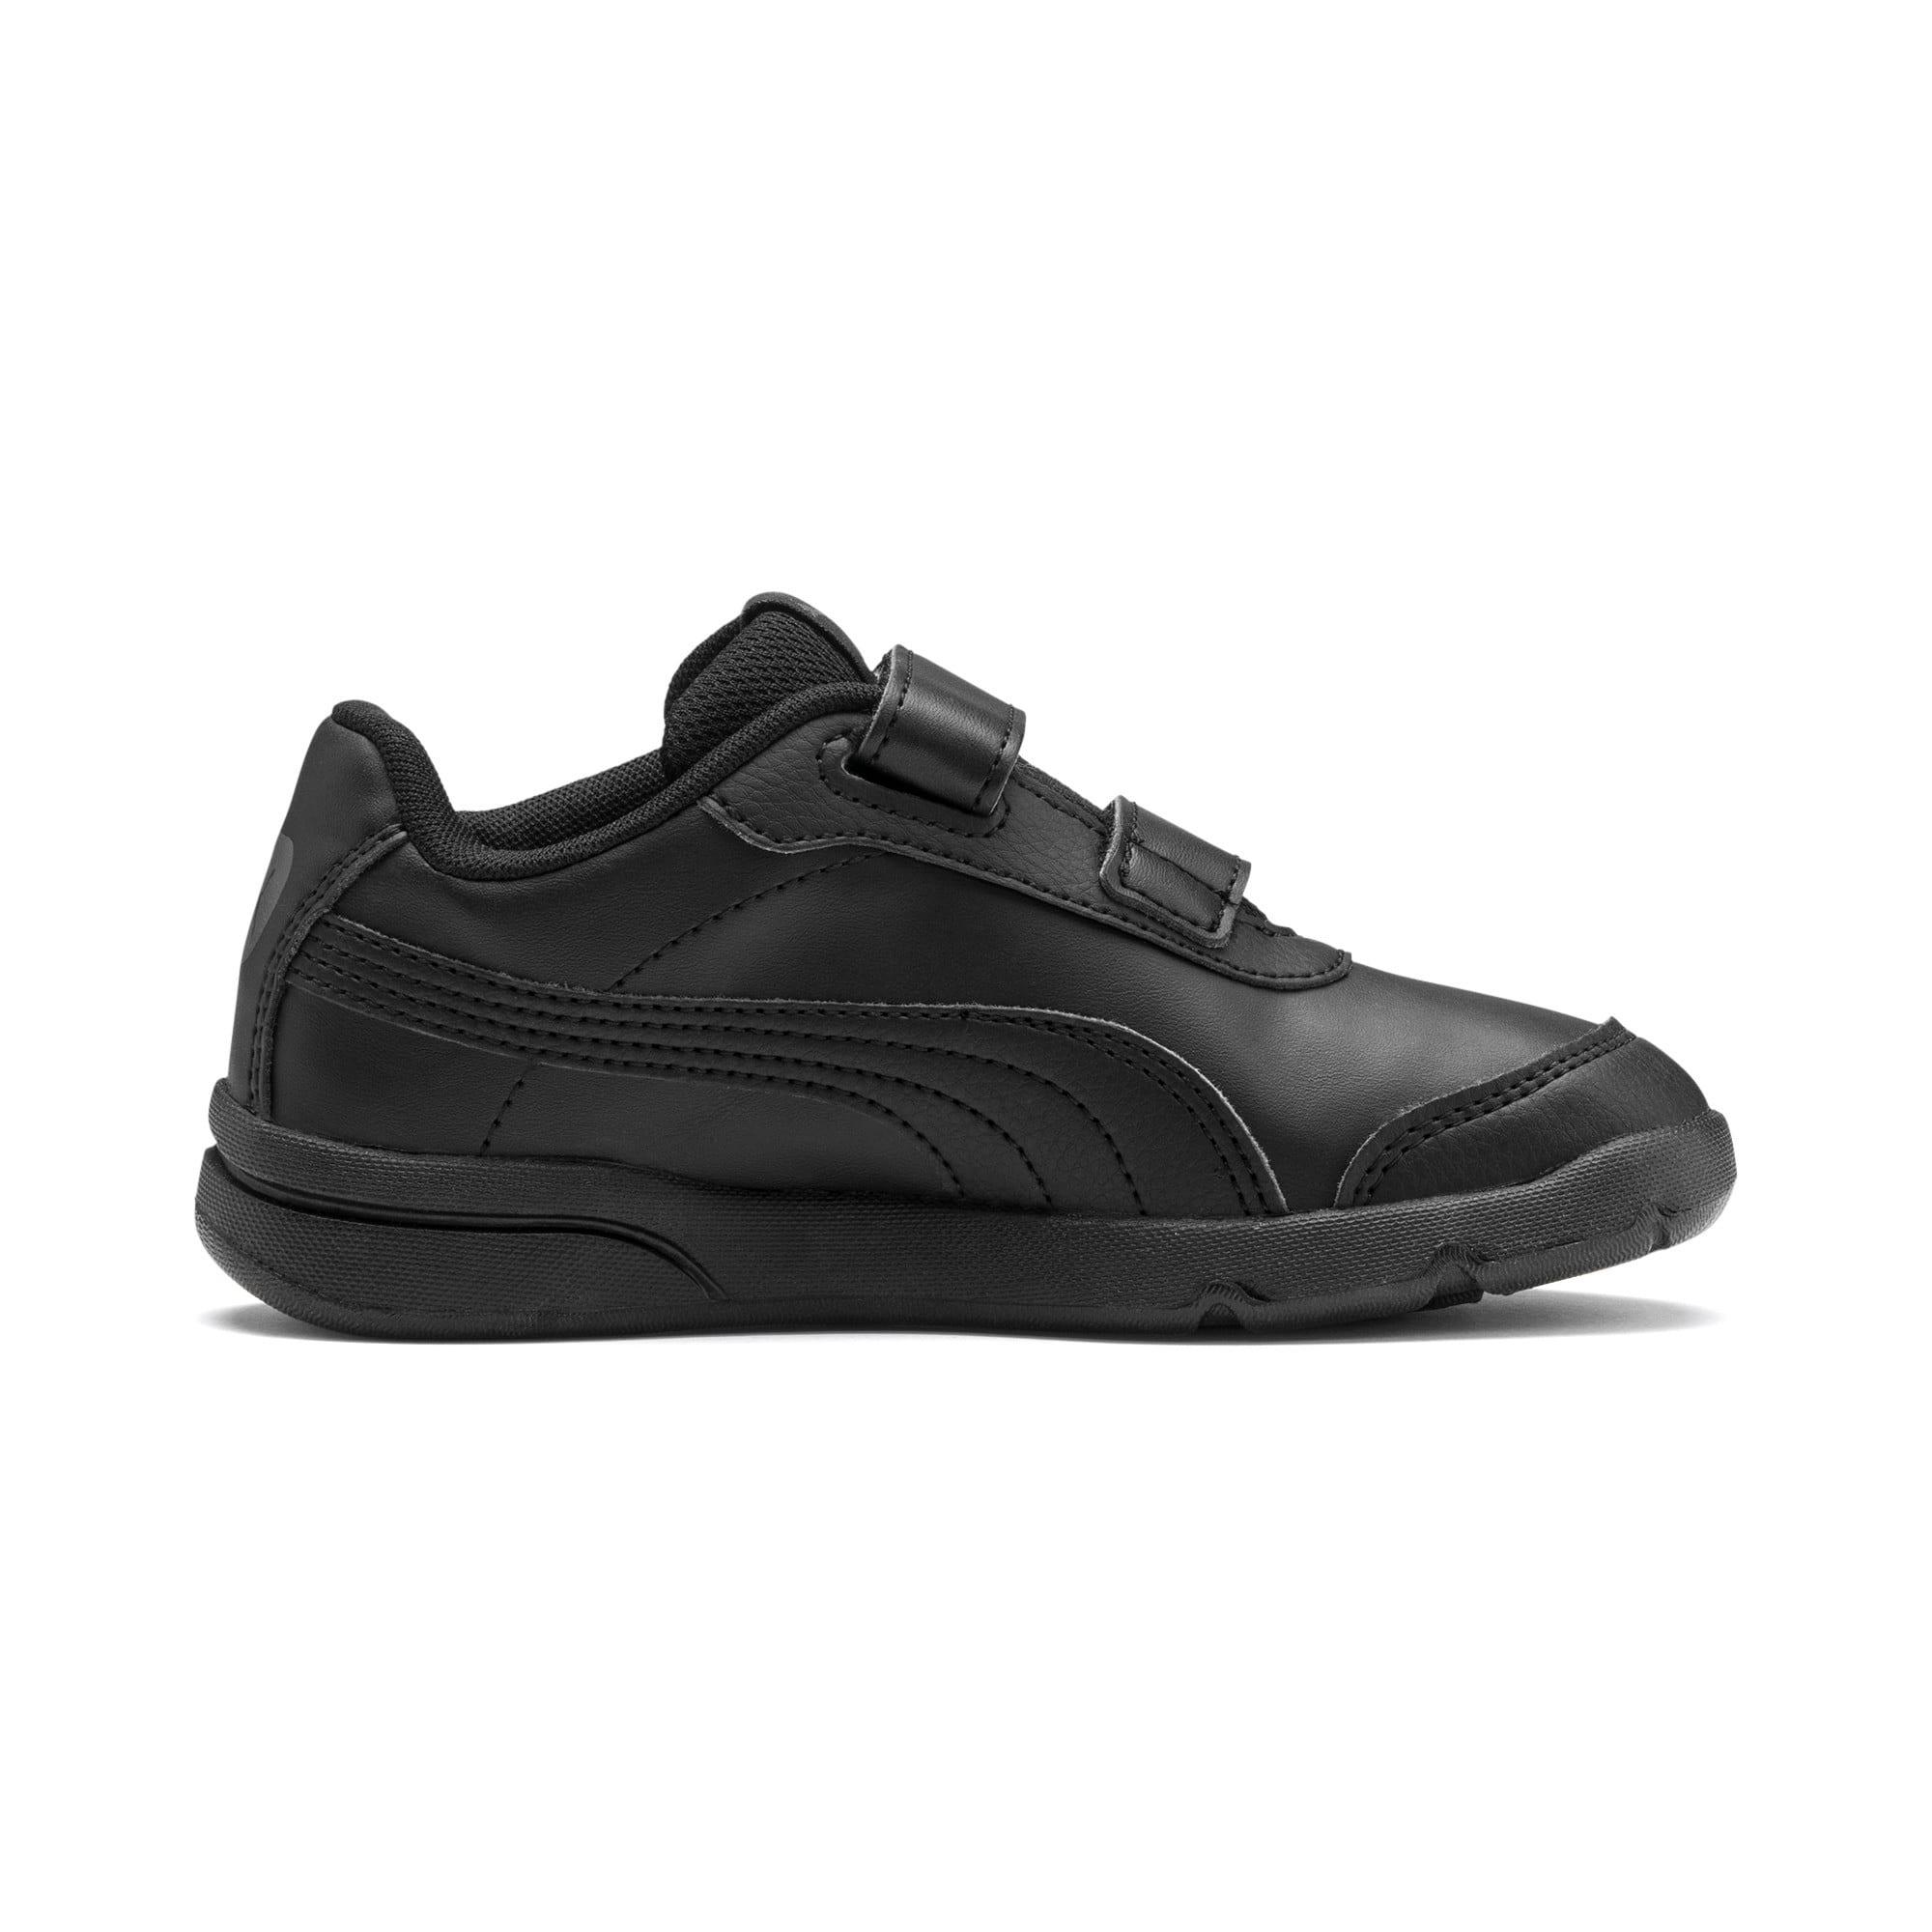 Thumbnail 5 of Stepfleex 2 SL VE V Kids' Trainers, Puma Black-Puma Black, medium